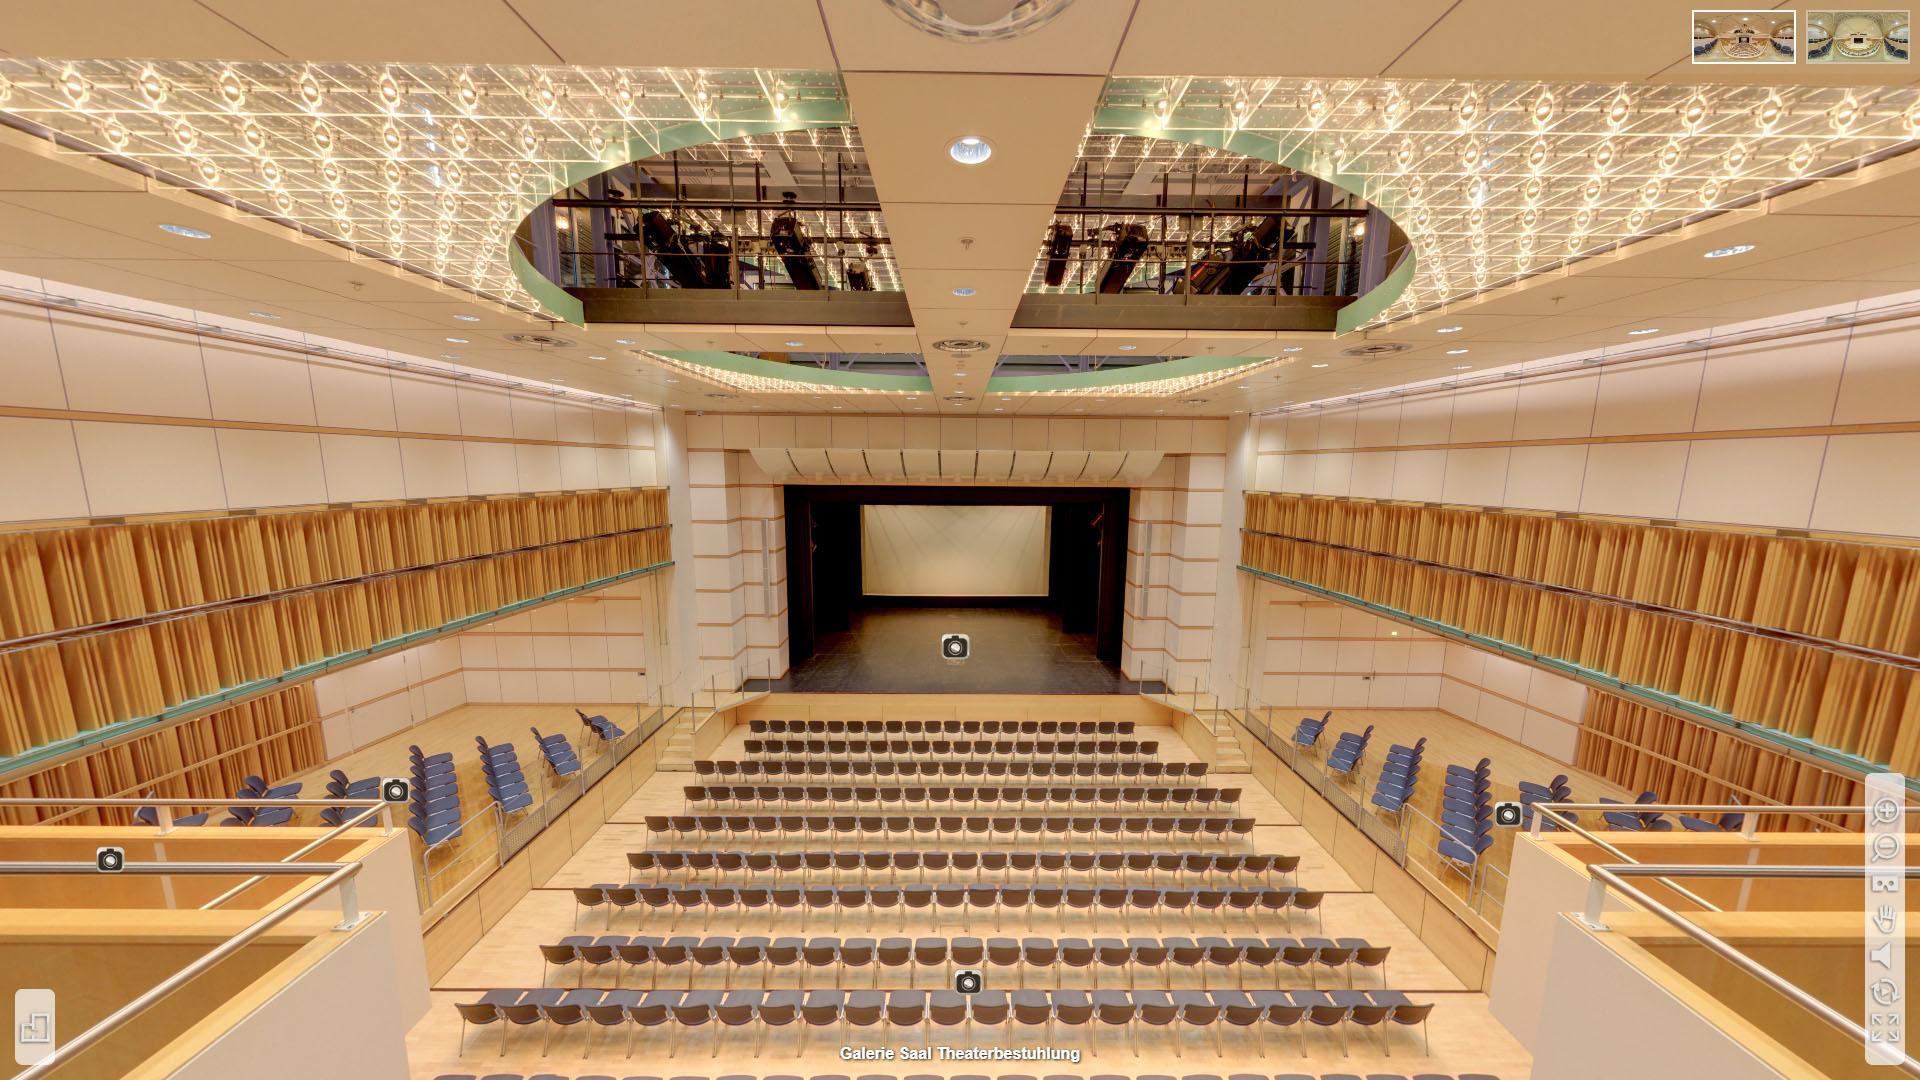 Lorzensaal Cham Galerie Saal Theaterbestuhlung